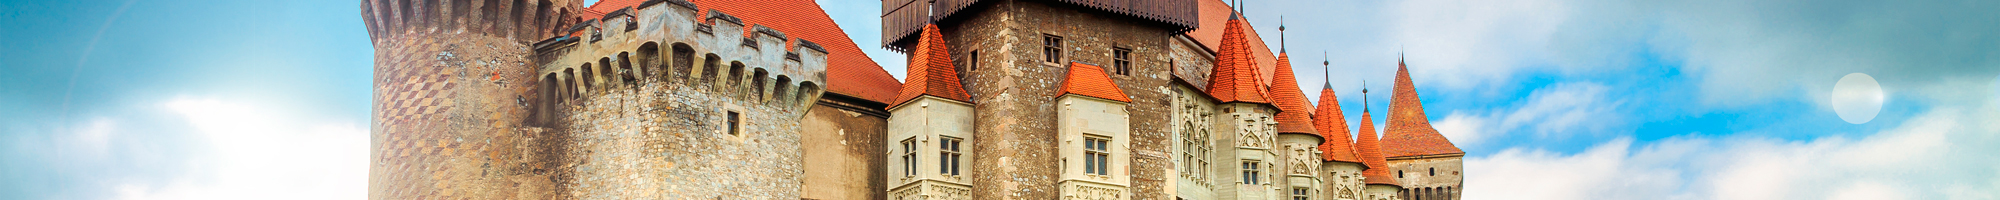 Hoteles en Suceava